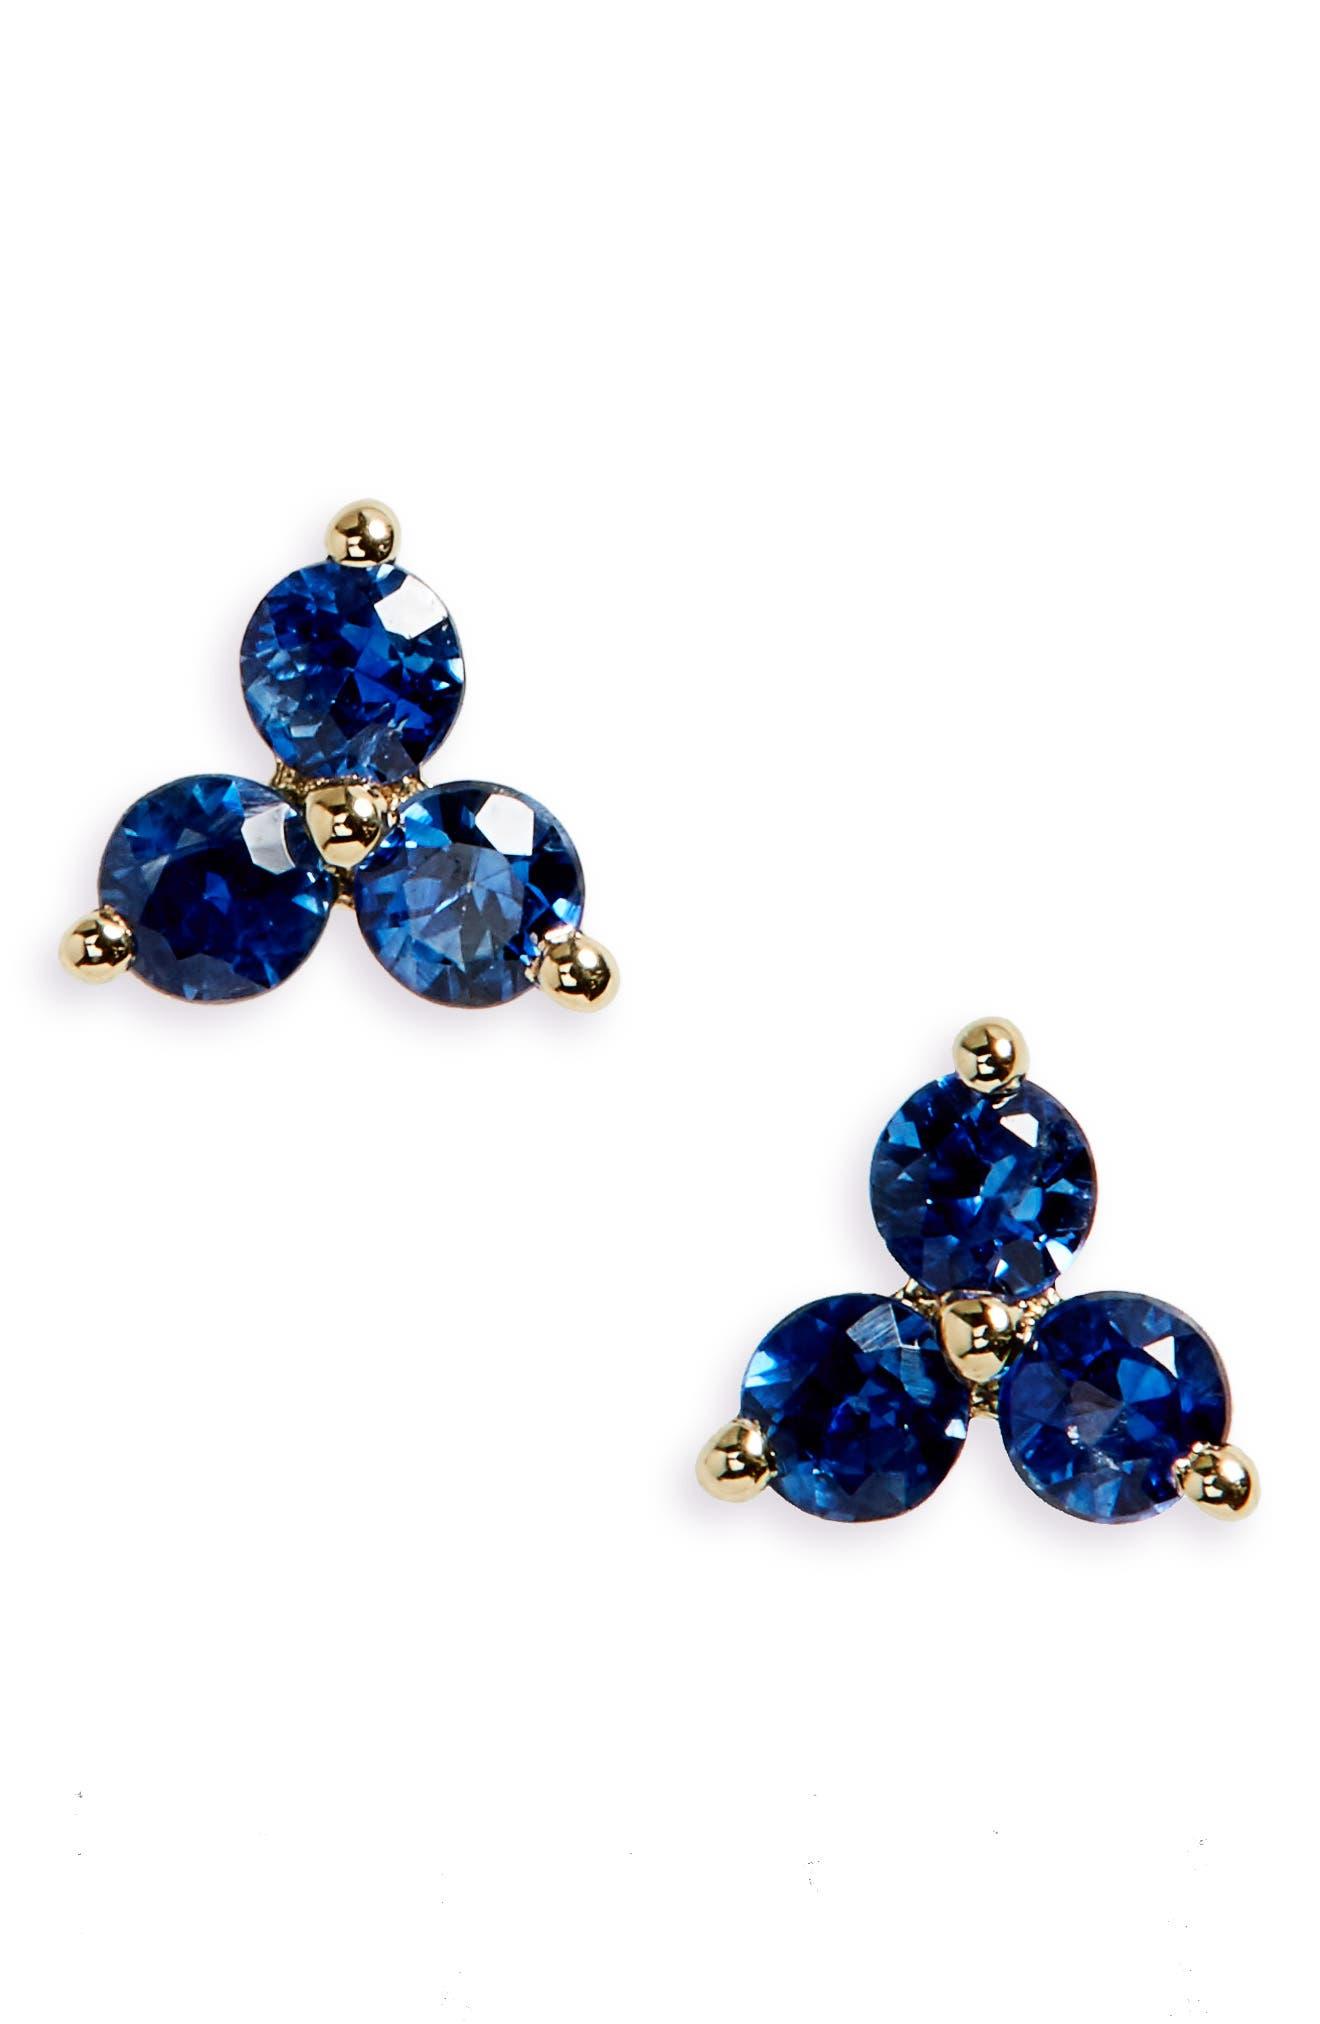 Gem Trio Stud Earrings,                             Main thumbnail 1, color,                             Sapphire